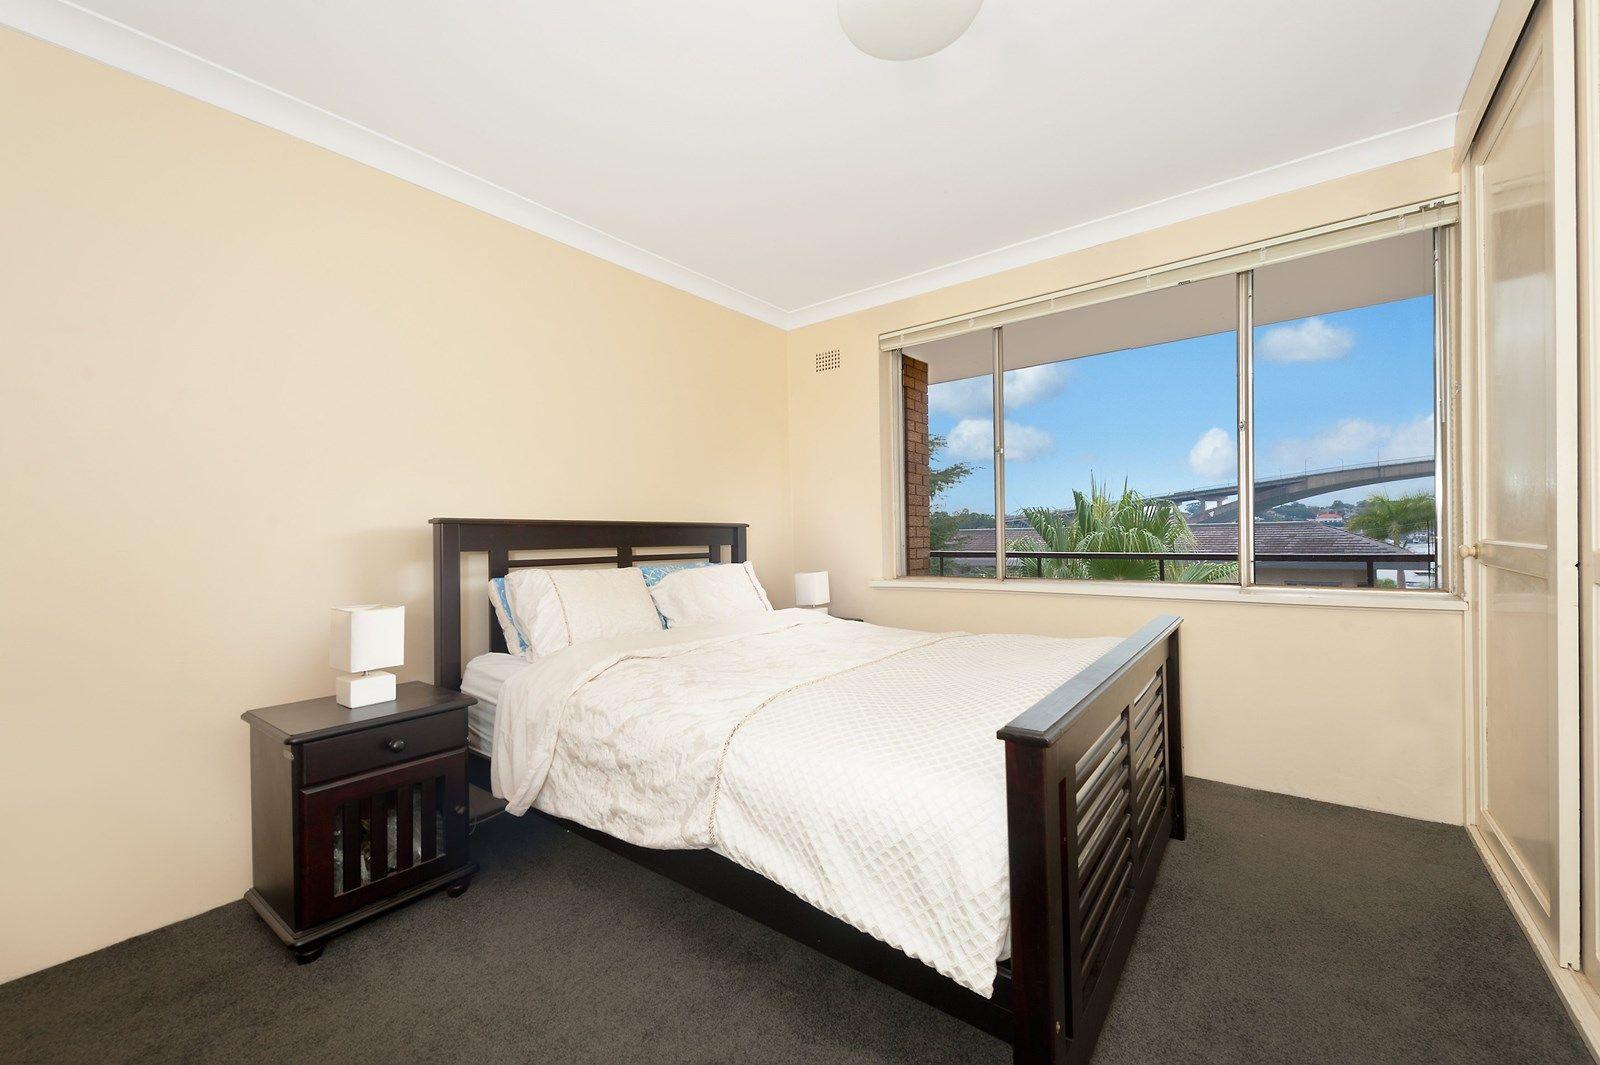 5/345 Victoria Place, Drummoyne NSW 2047, Image 2